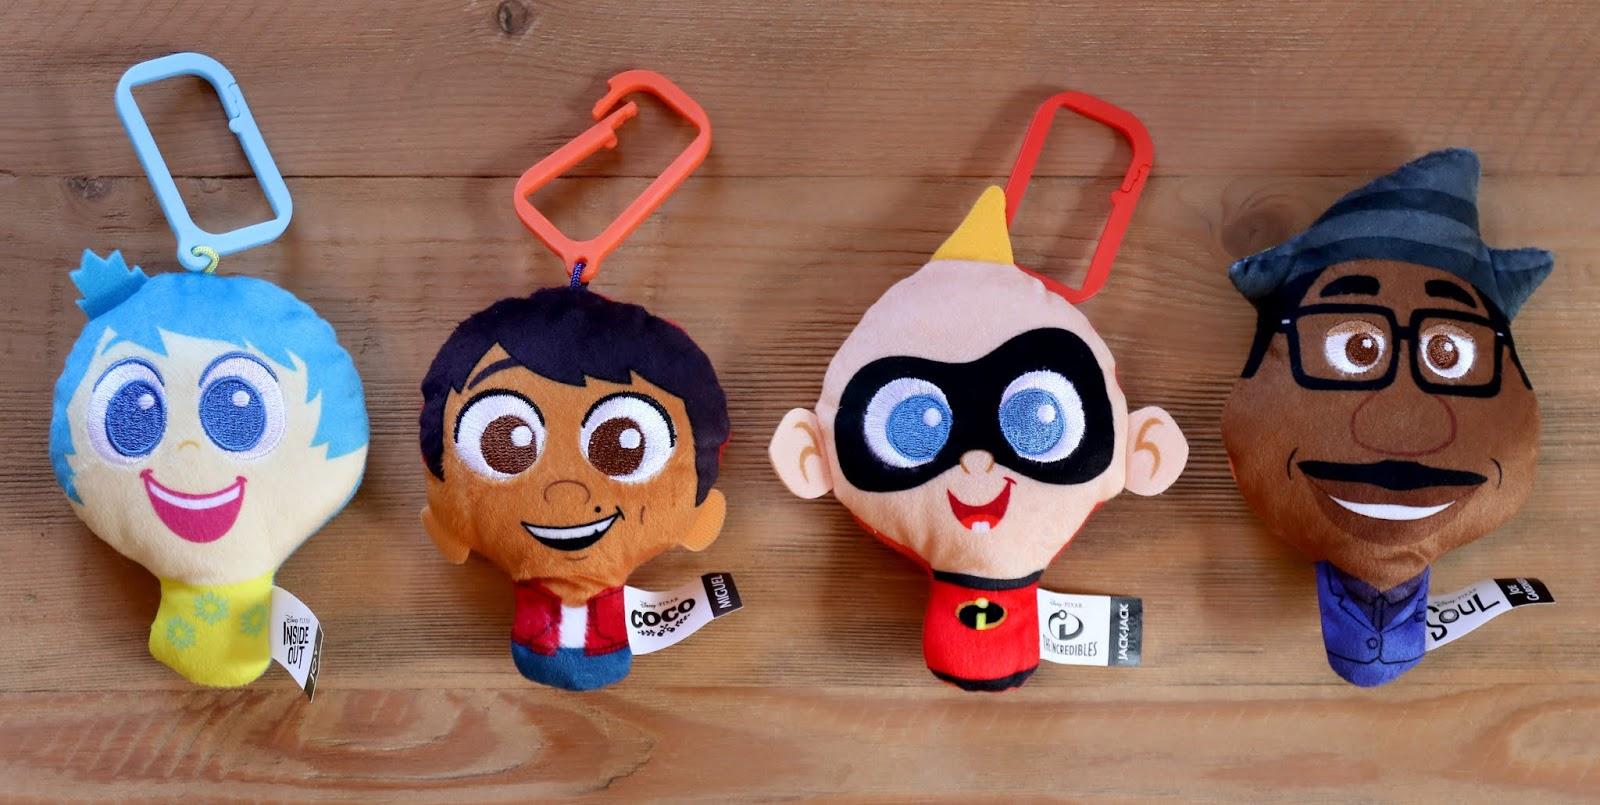 #7 Jack-Jack Disney Pixar Mcdonalds Happy Meal Plush Toy Incredibles key chain